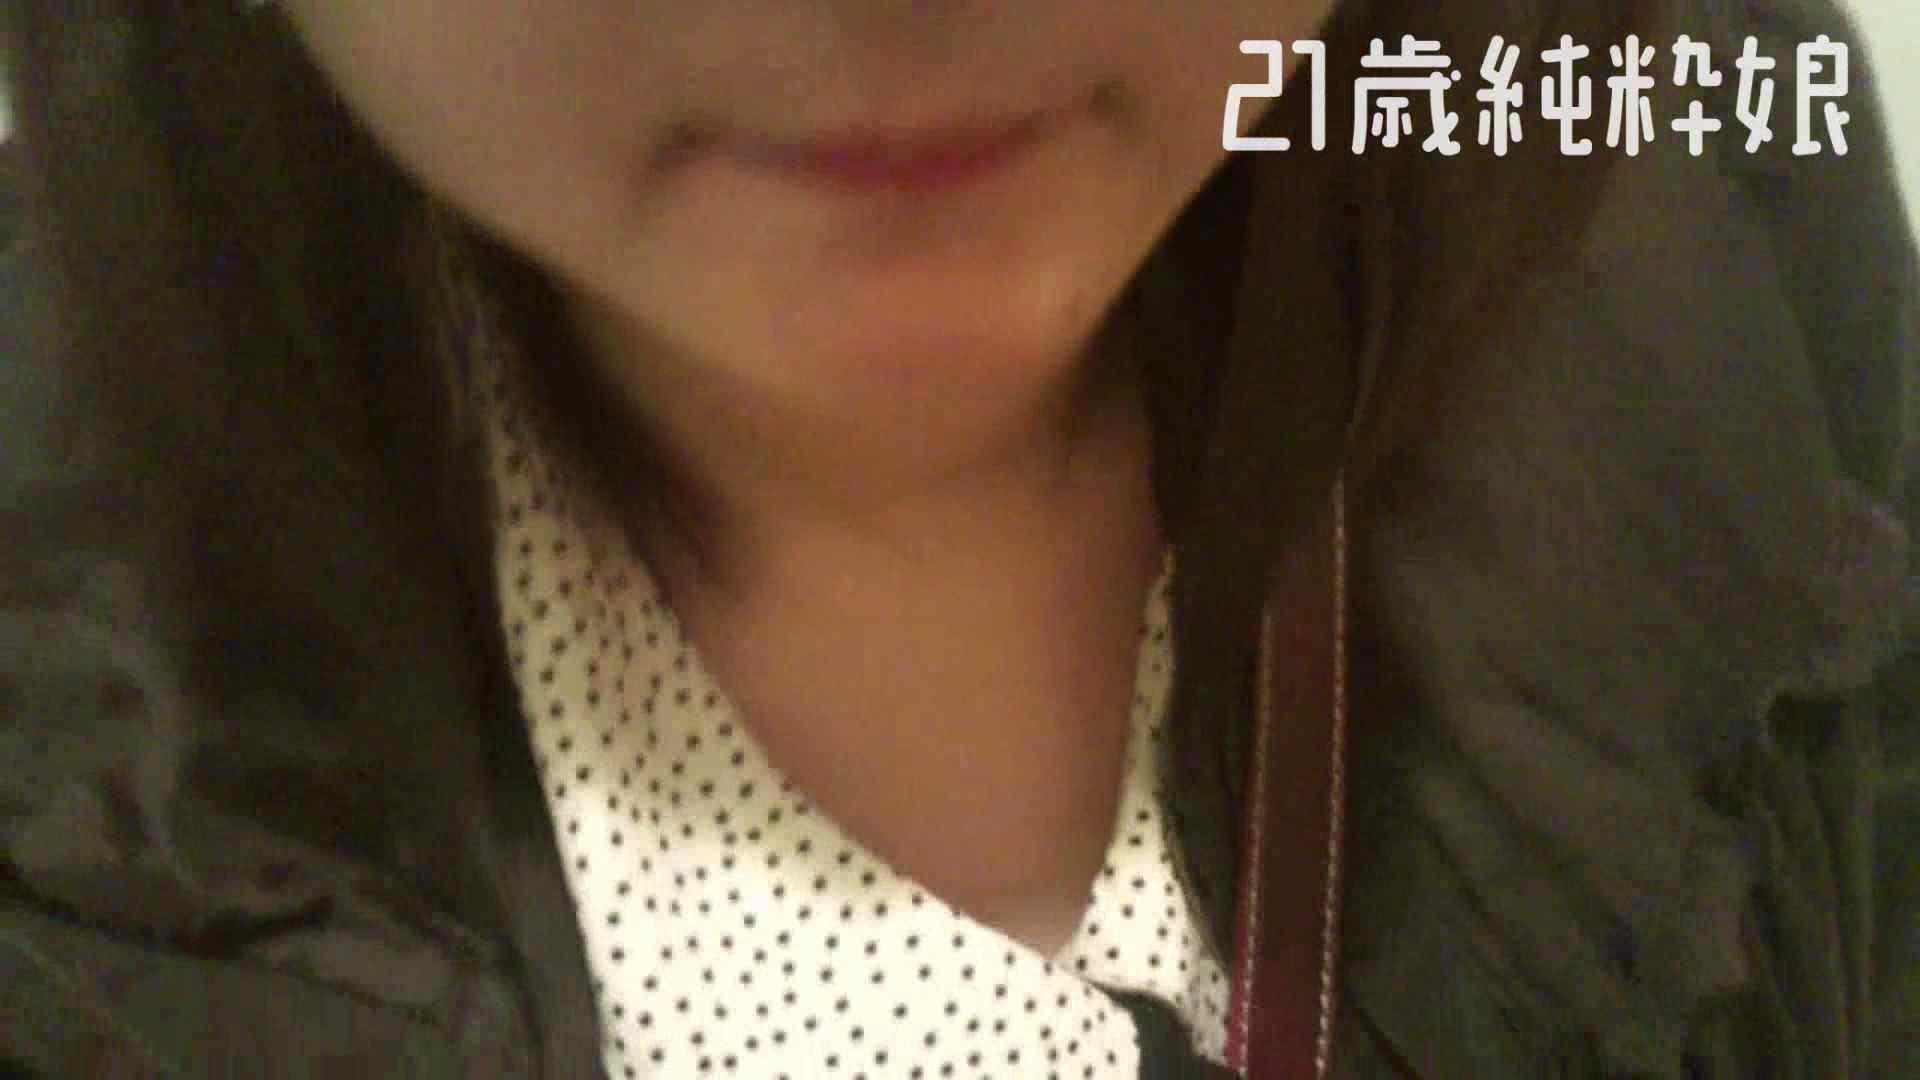 Gカップ21歳純粋嬢第2弾Vol.5 美女OL | 学校内で  78連発 65